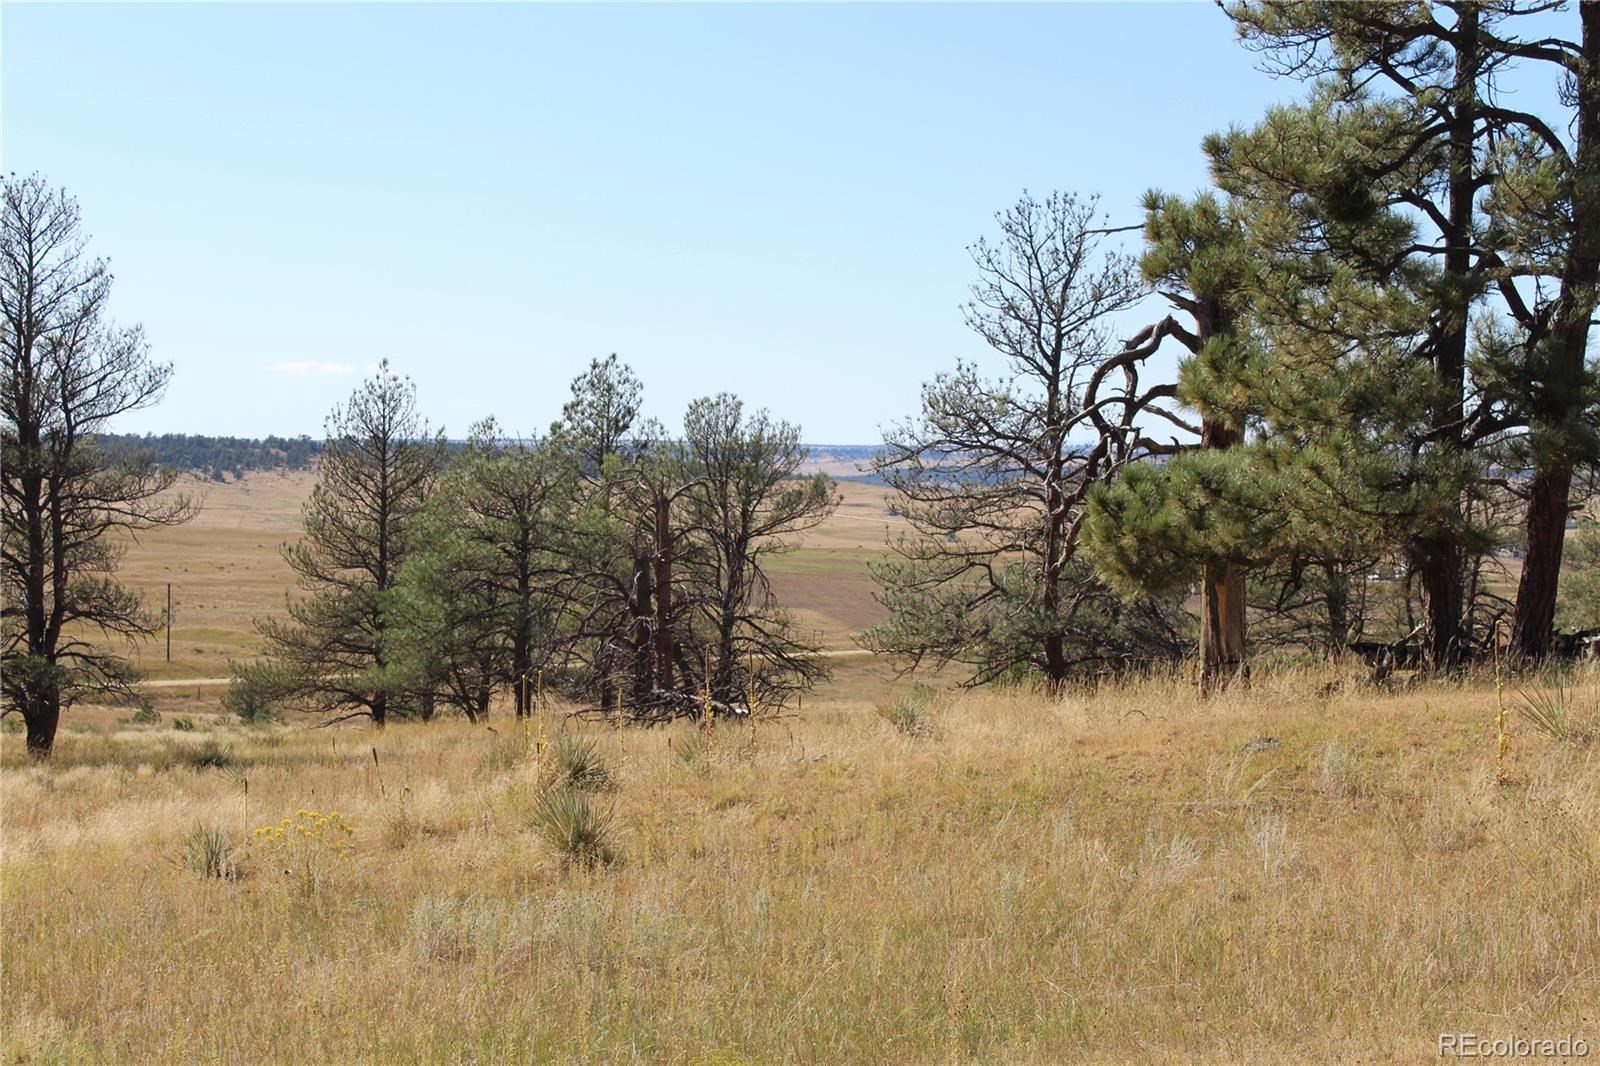 MLS# 2877174 - 3 - Cattle Circle, Kiowa, CO 80117